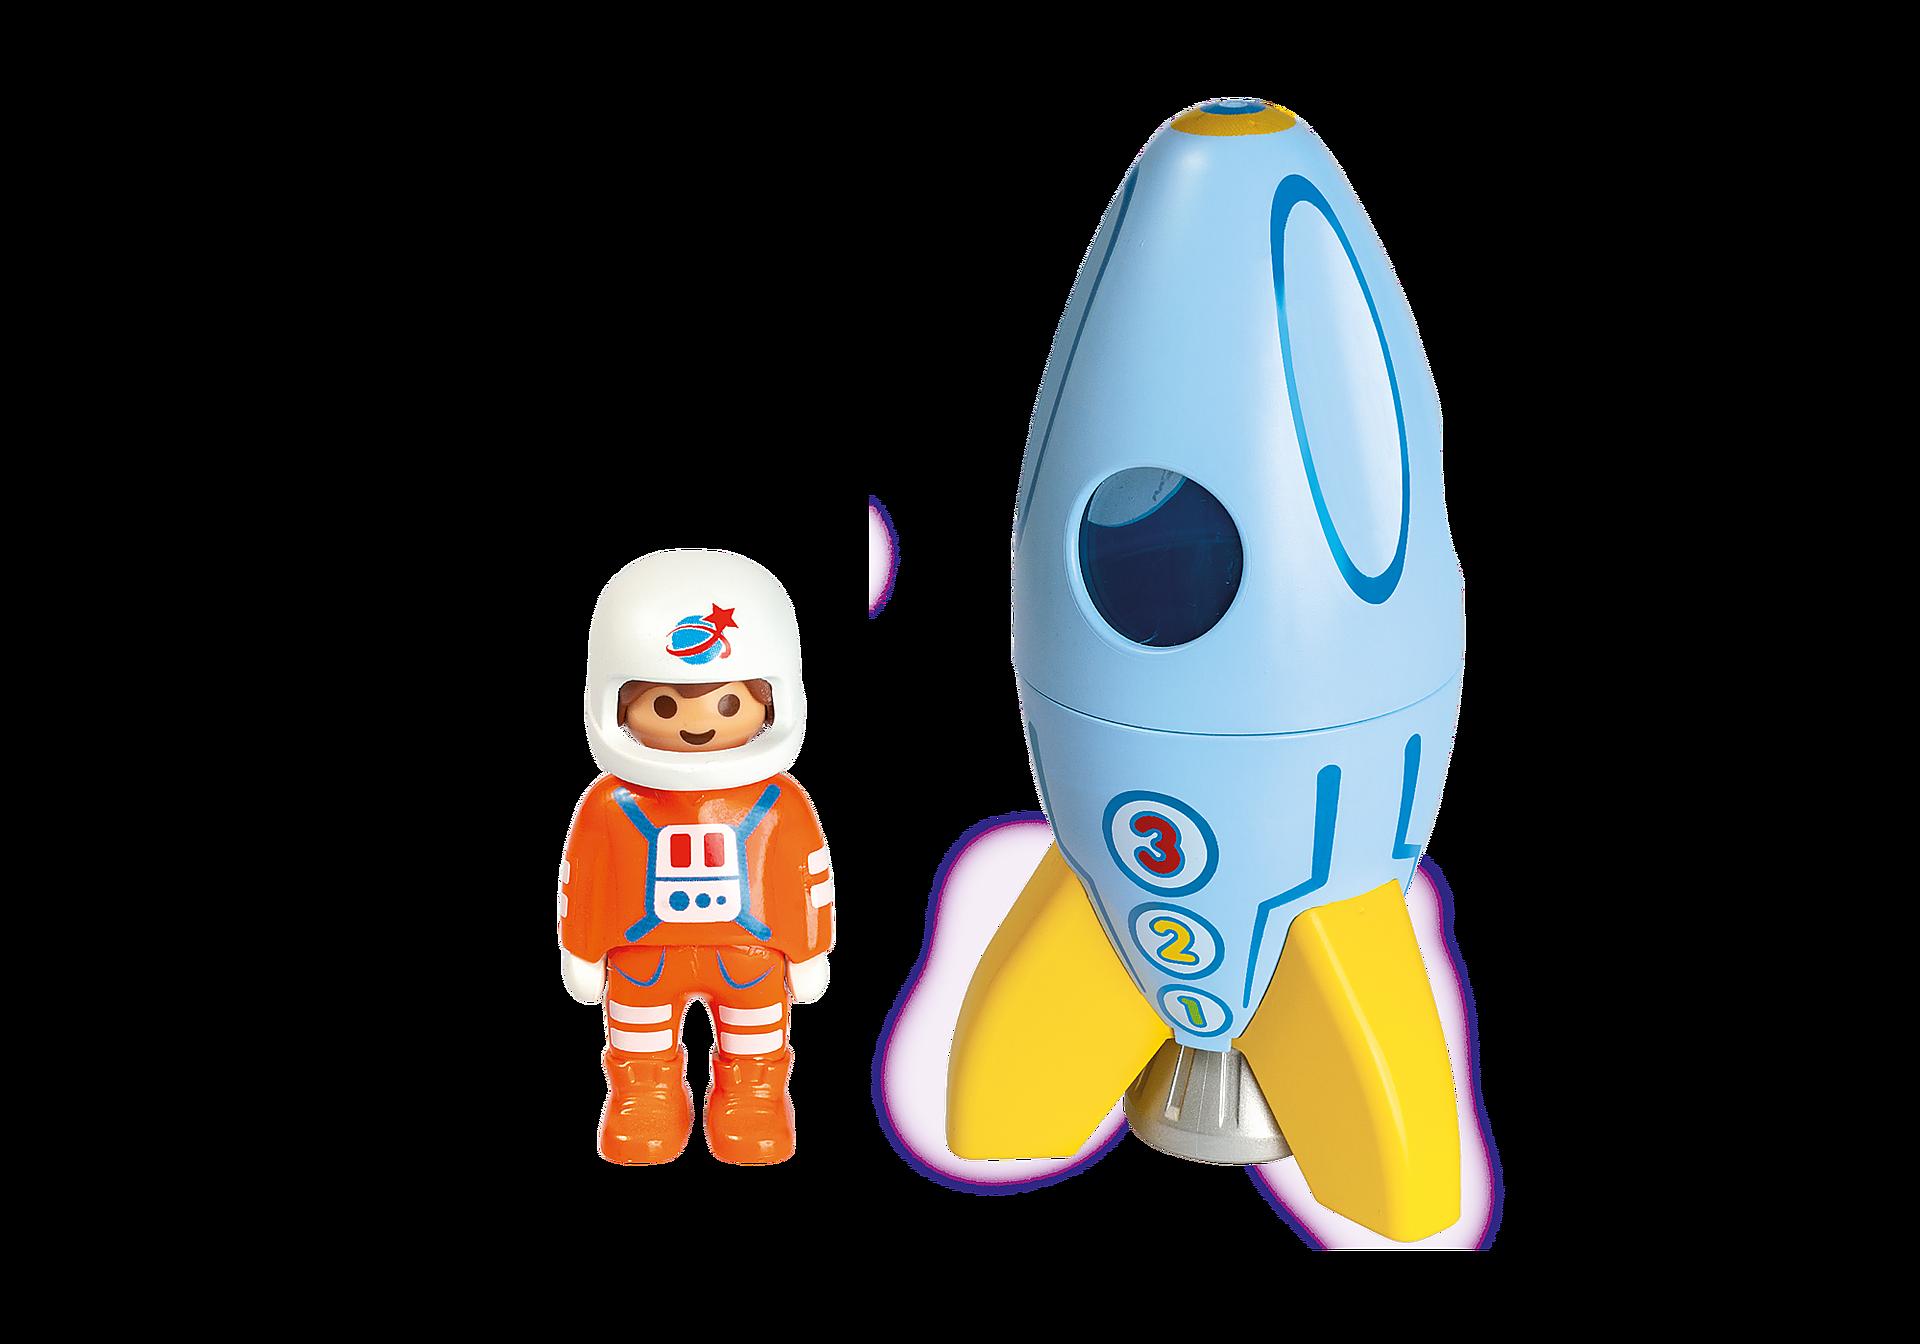 70186 Astronaut mit Rakete zoom image3